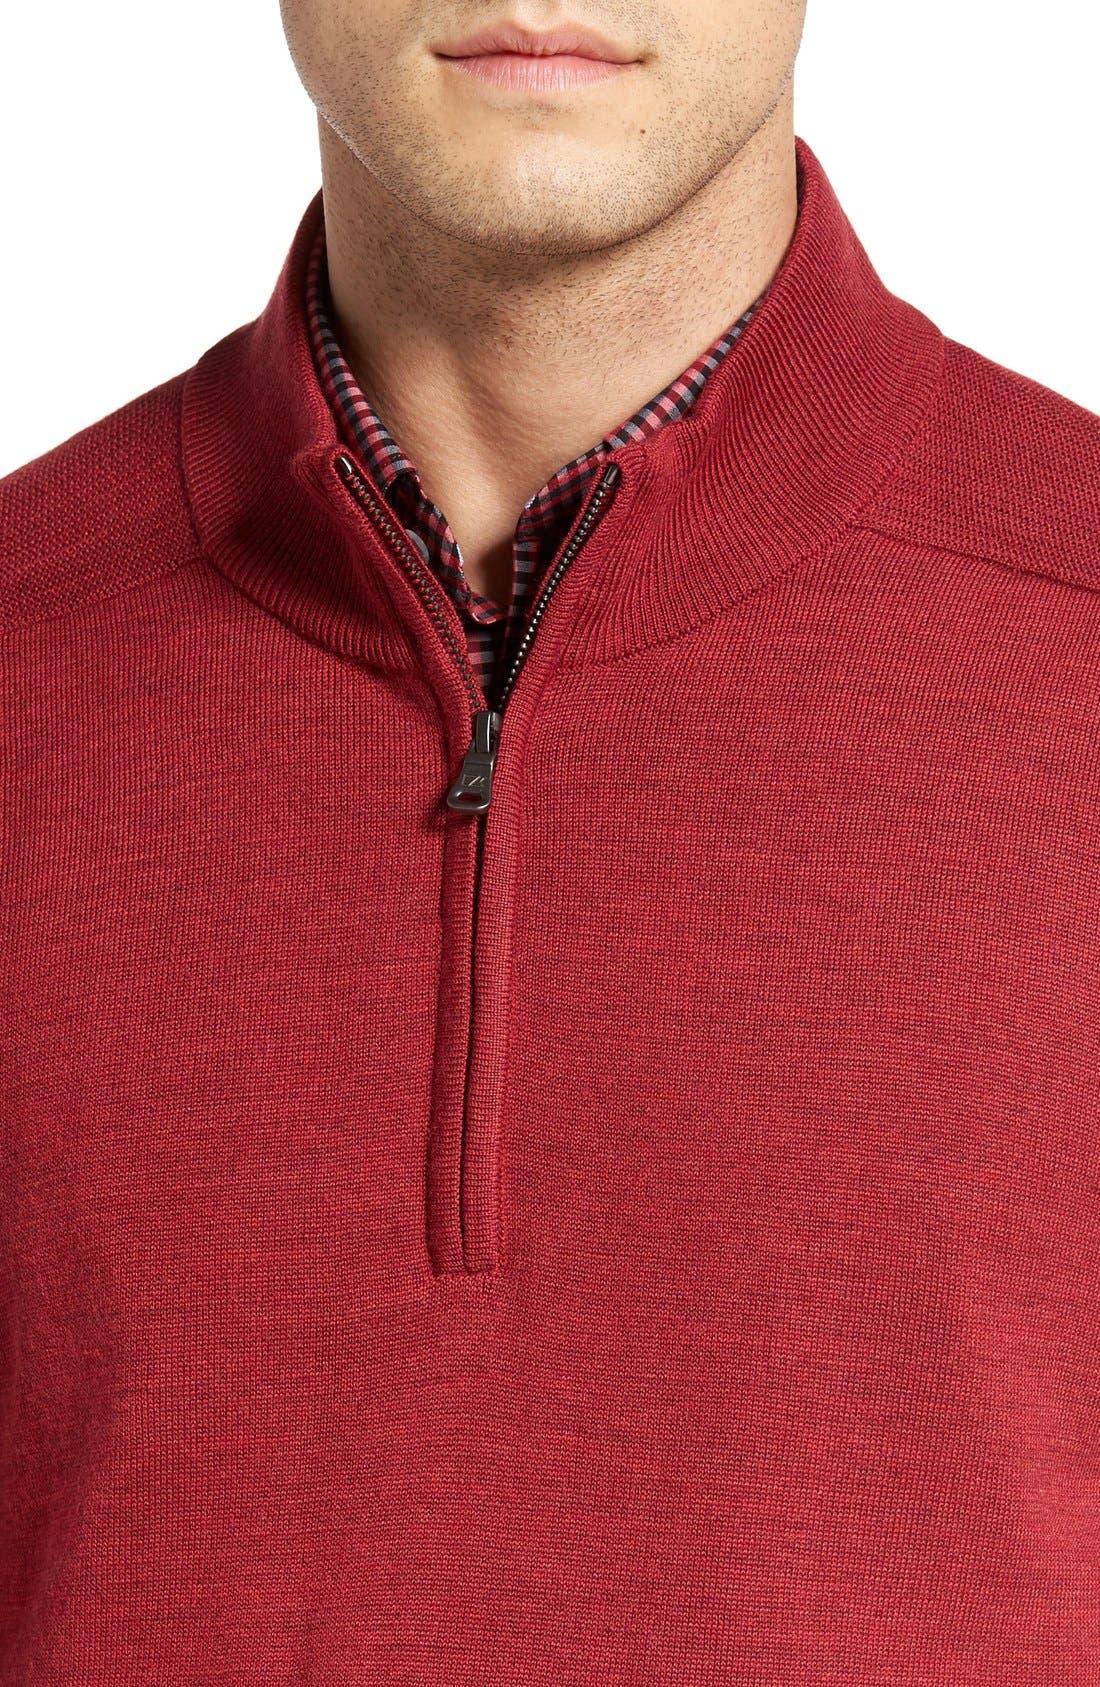 Douglas Quarter Zip Wool Blend Sweater,                             Alternate thumbnail 24, color,